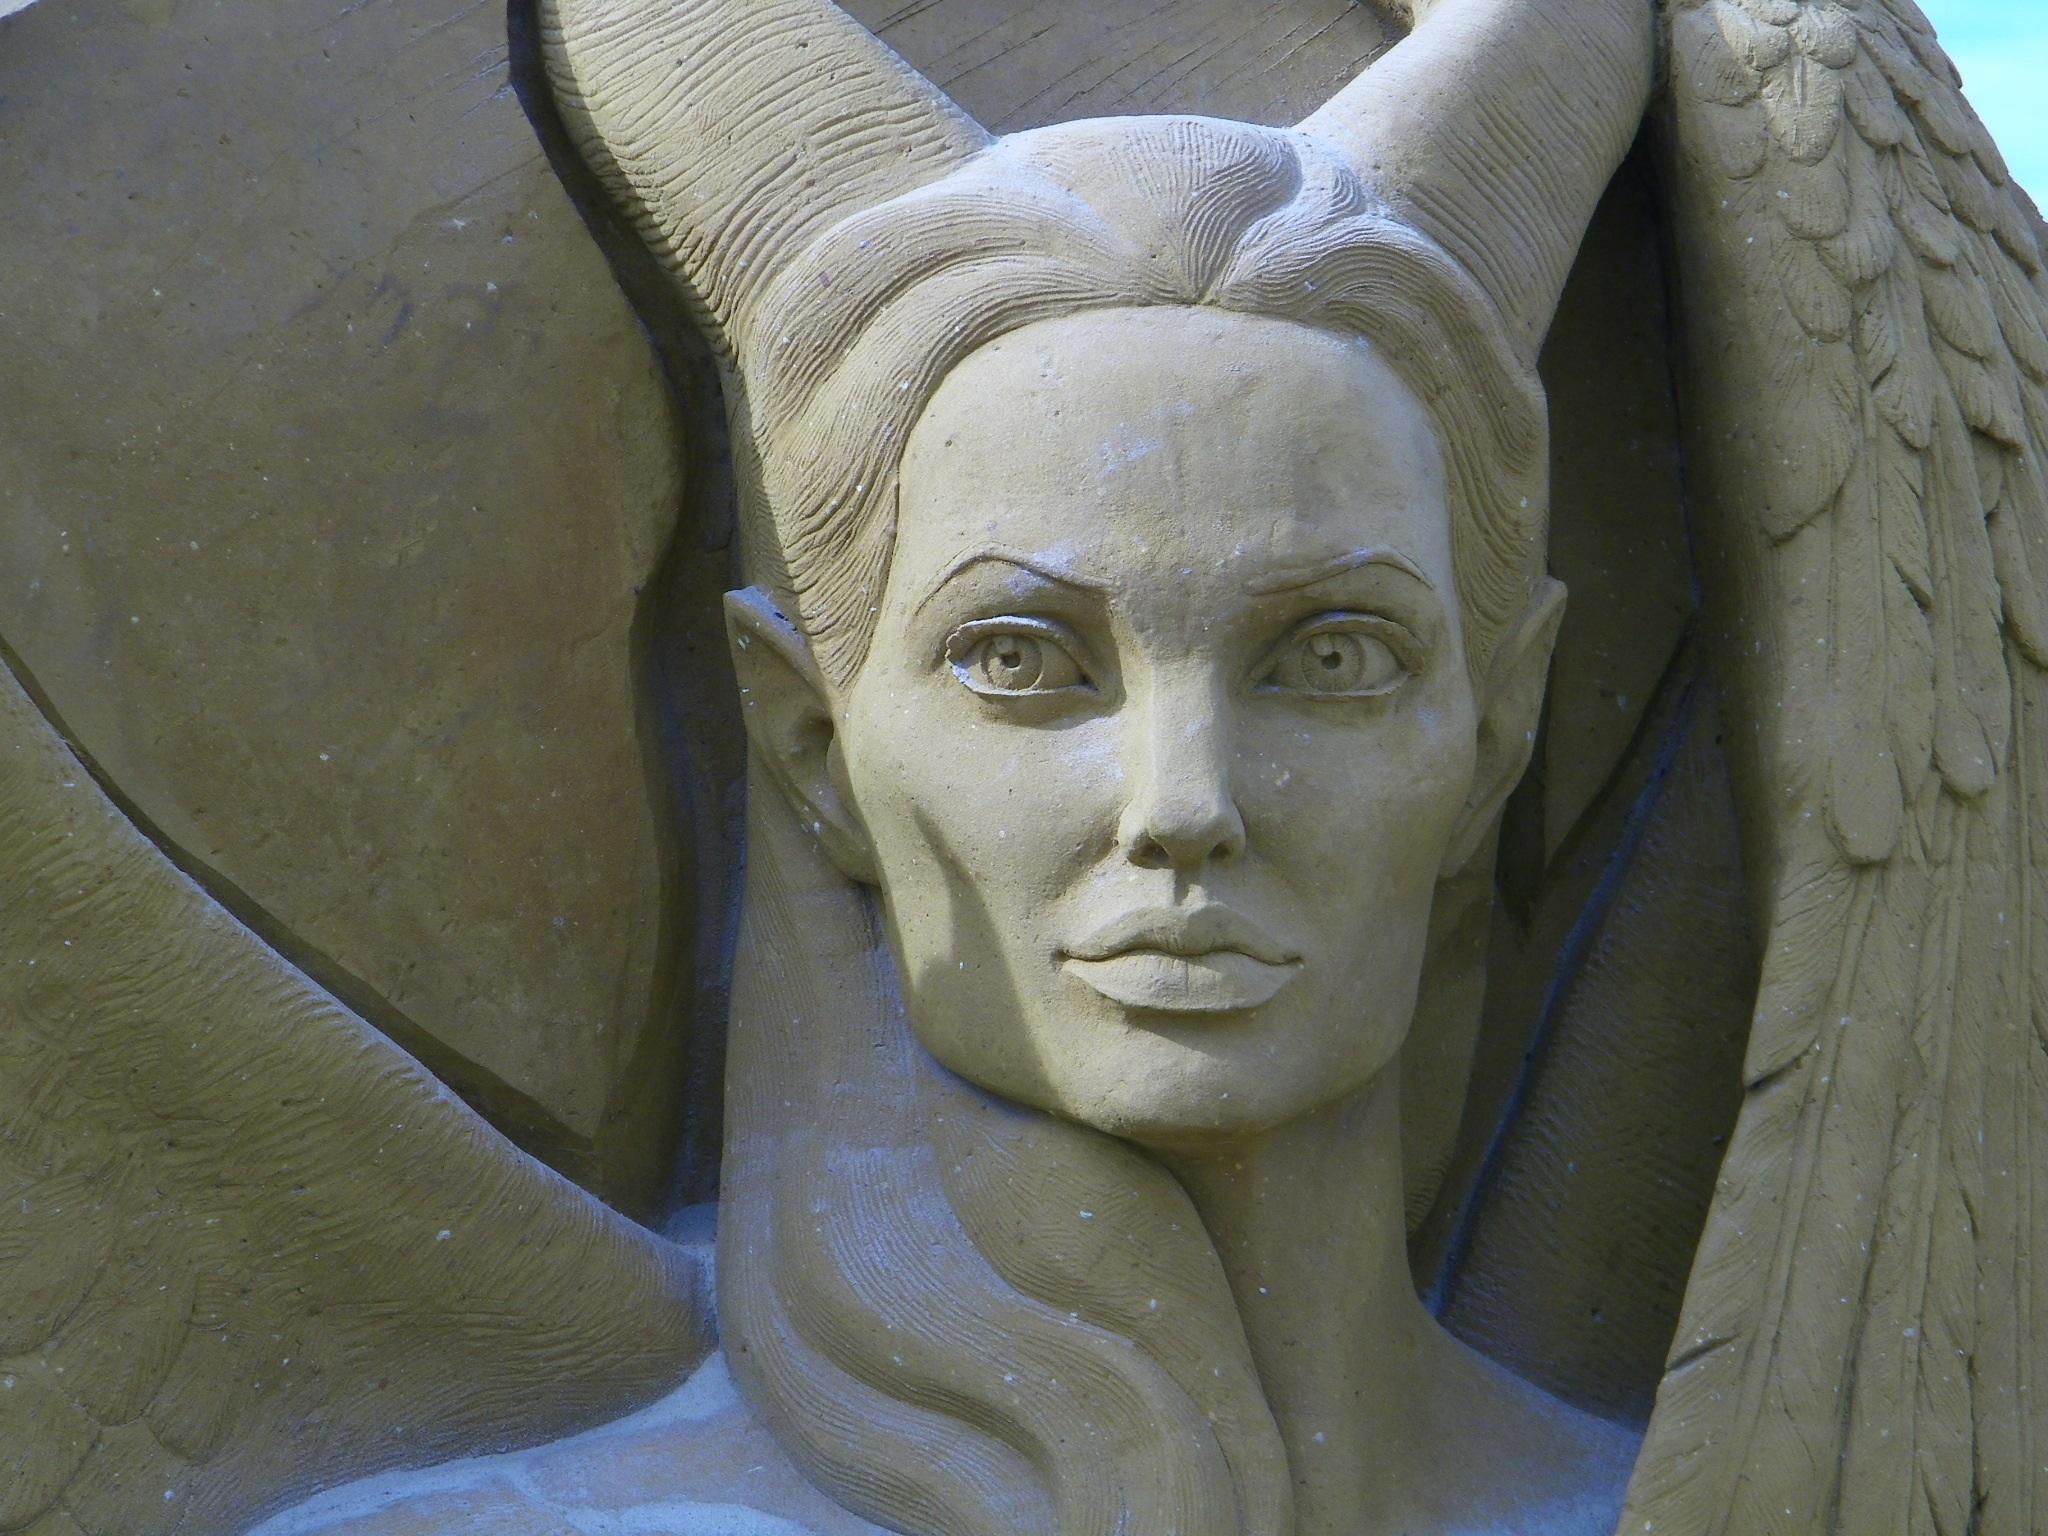 maleficent statue